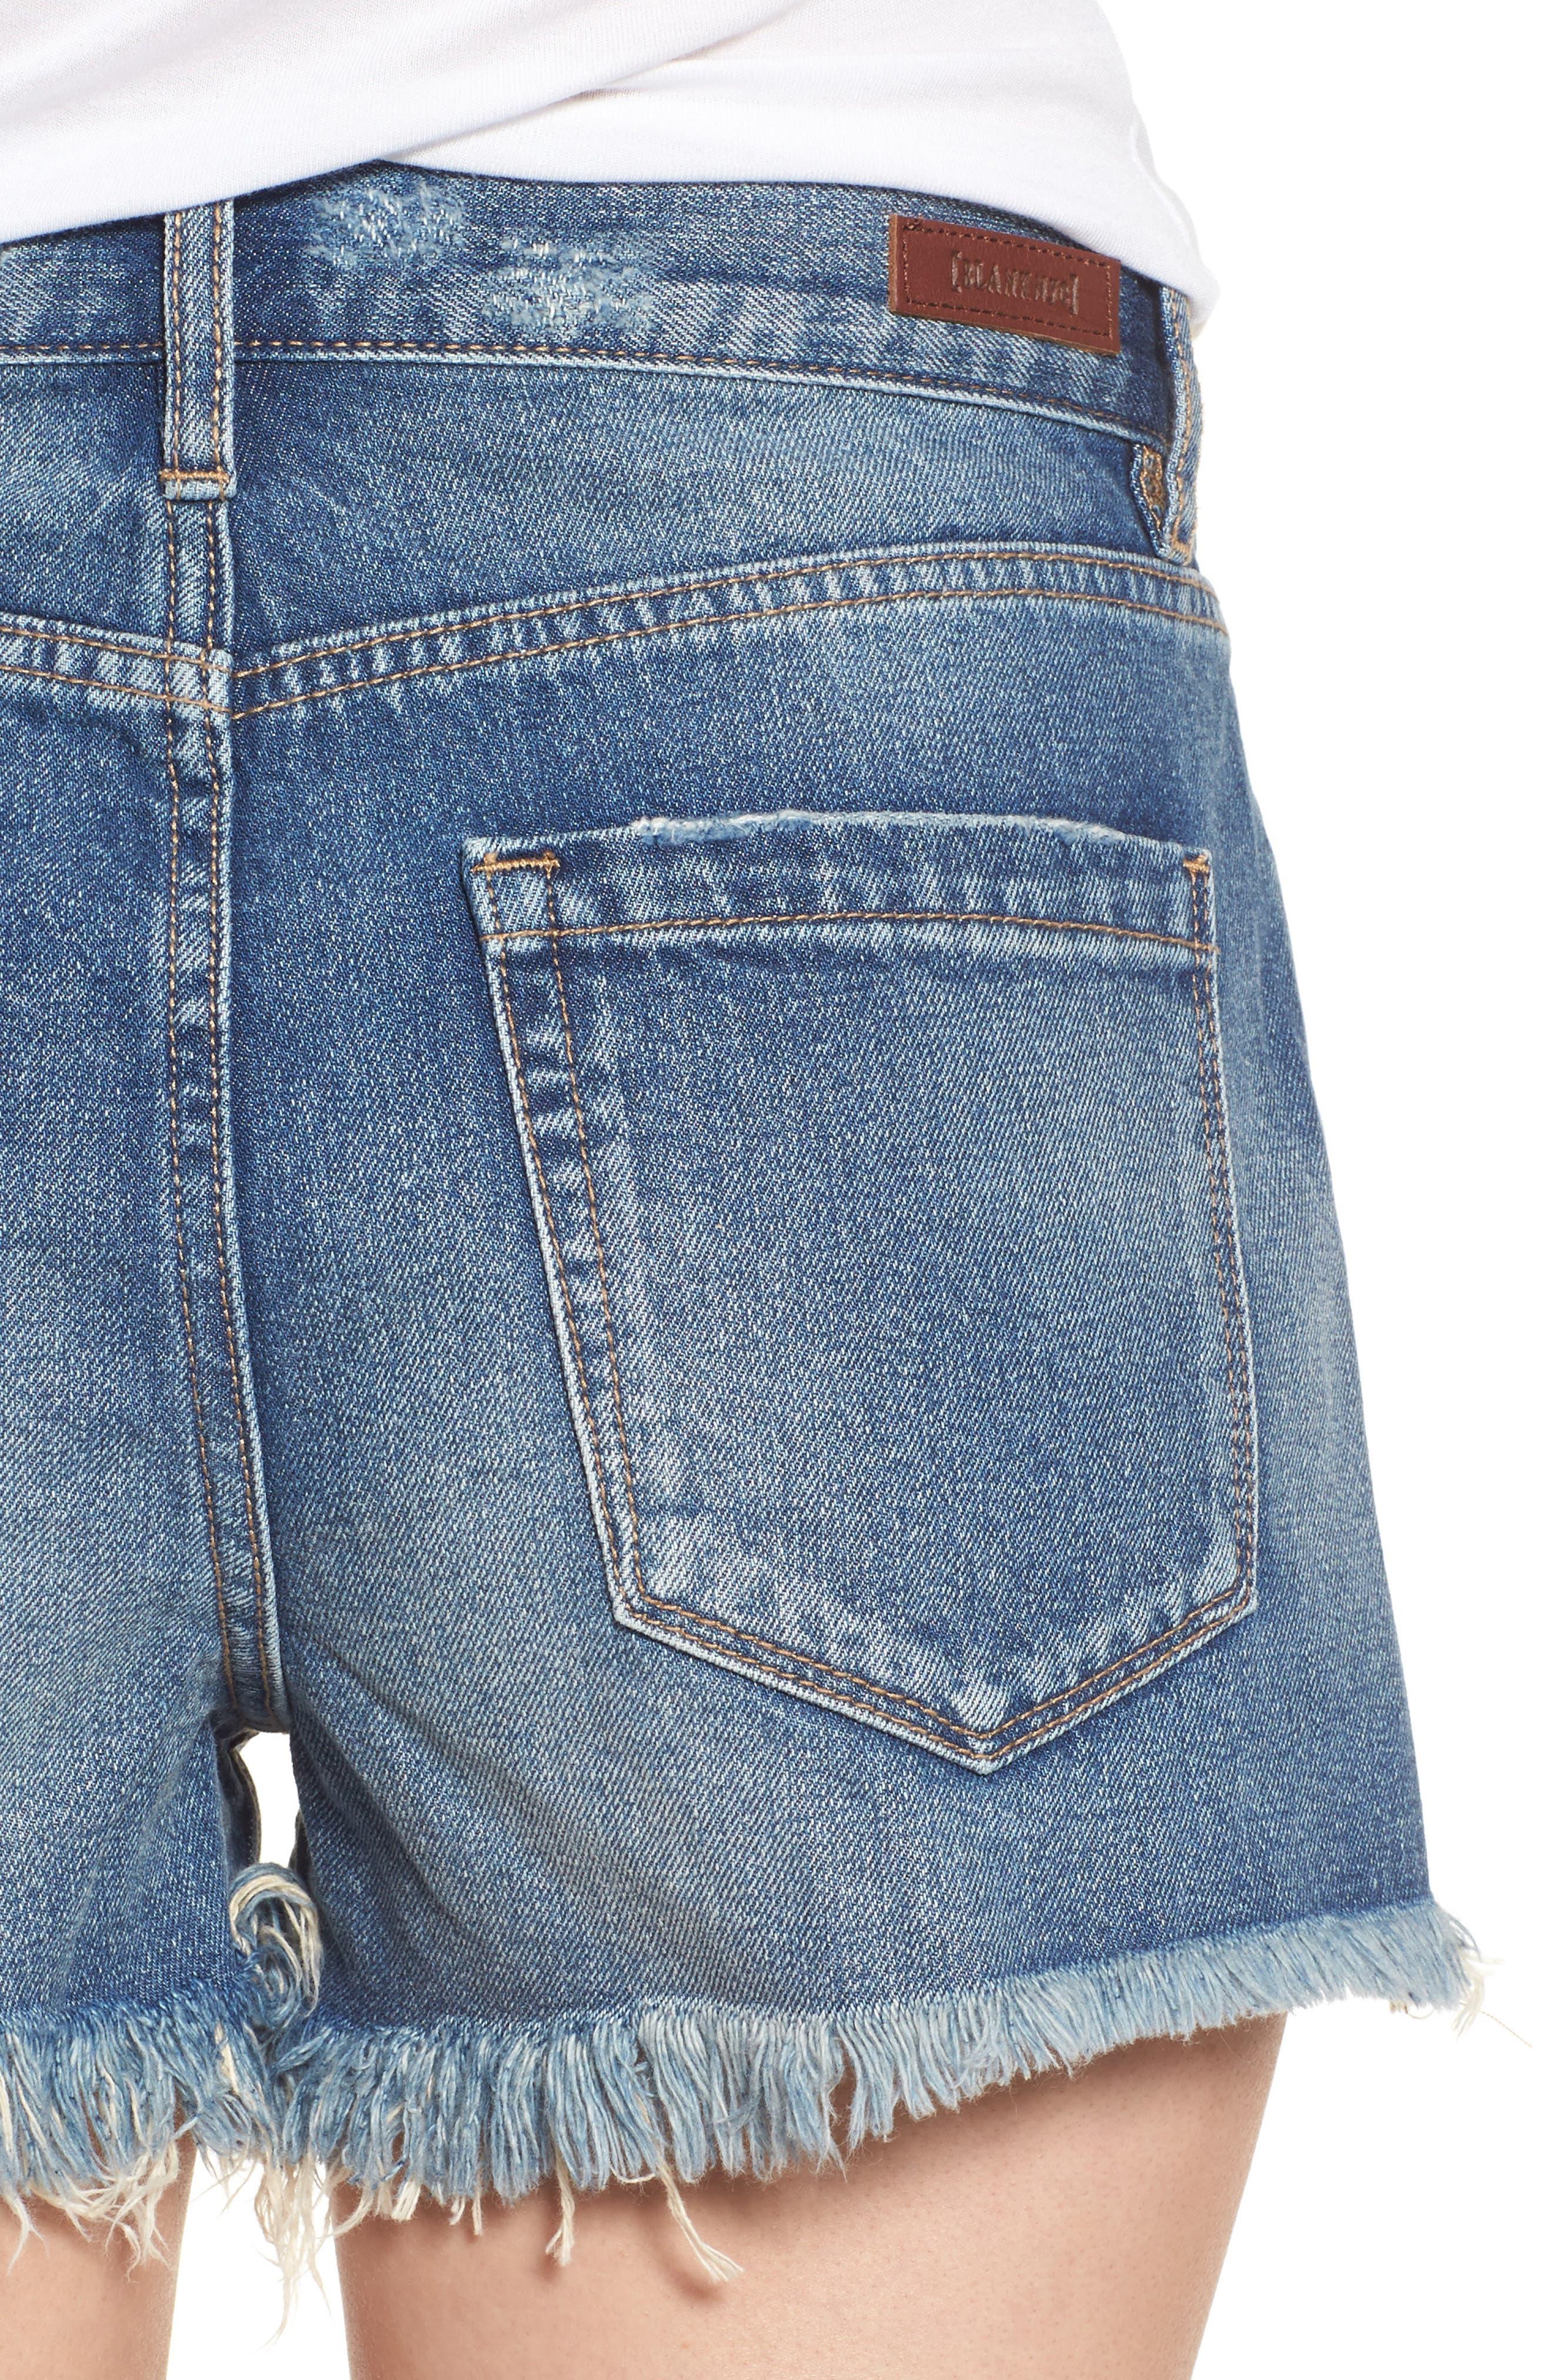 Pin-Up Distressed Denim Shorts,                             Alternate thumbnail 4, color,                             400